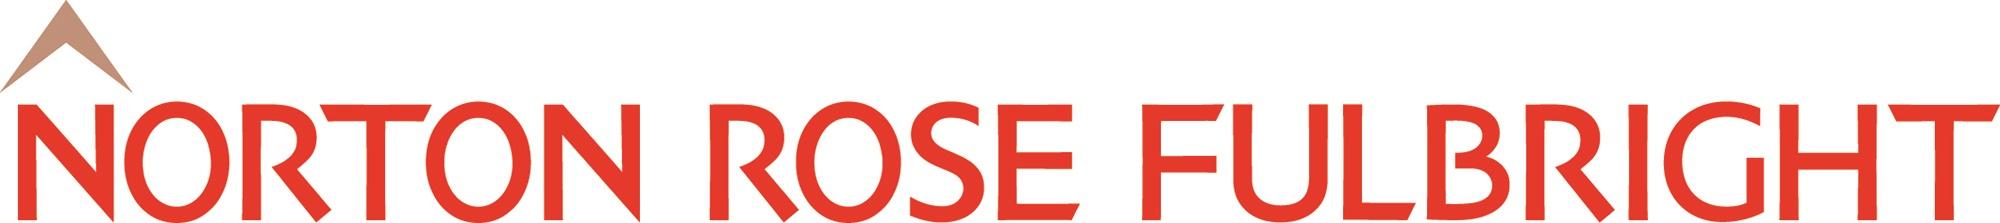 Norton Rose Fulbright Logo 2019